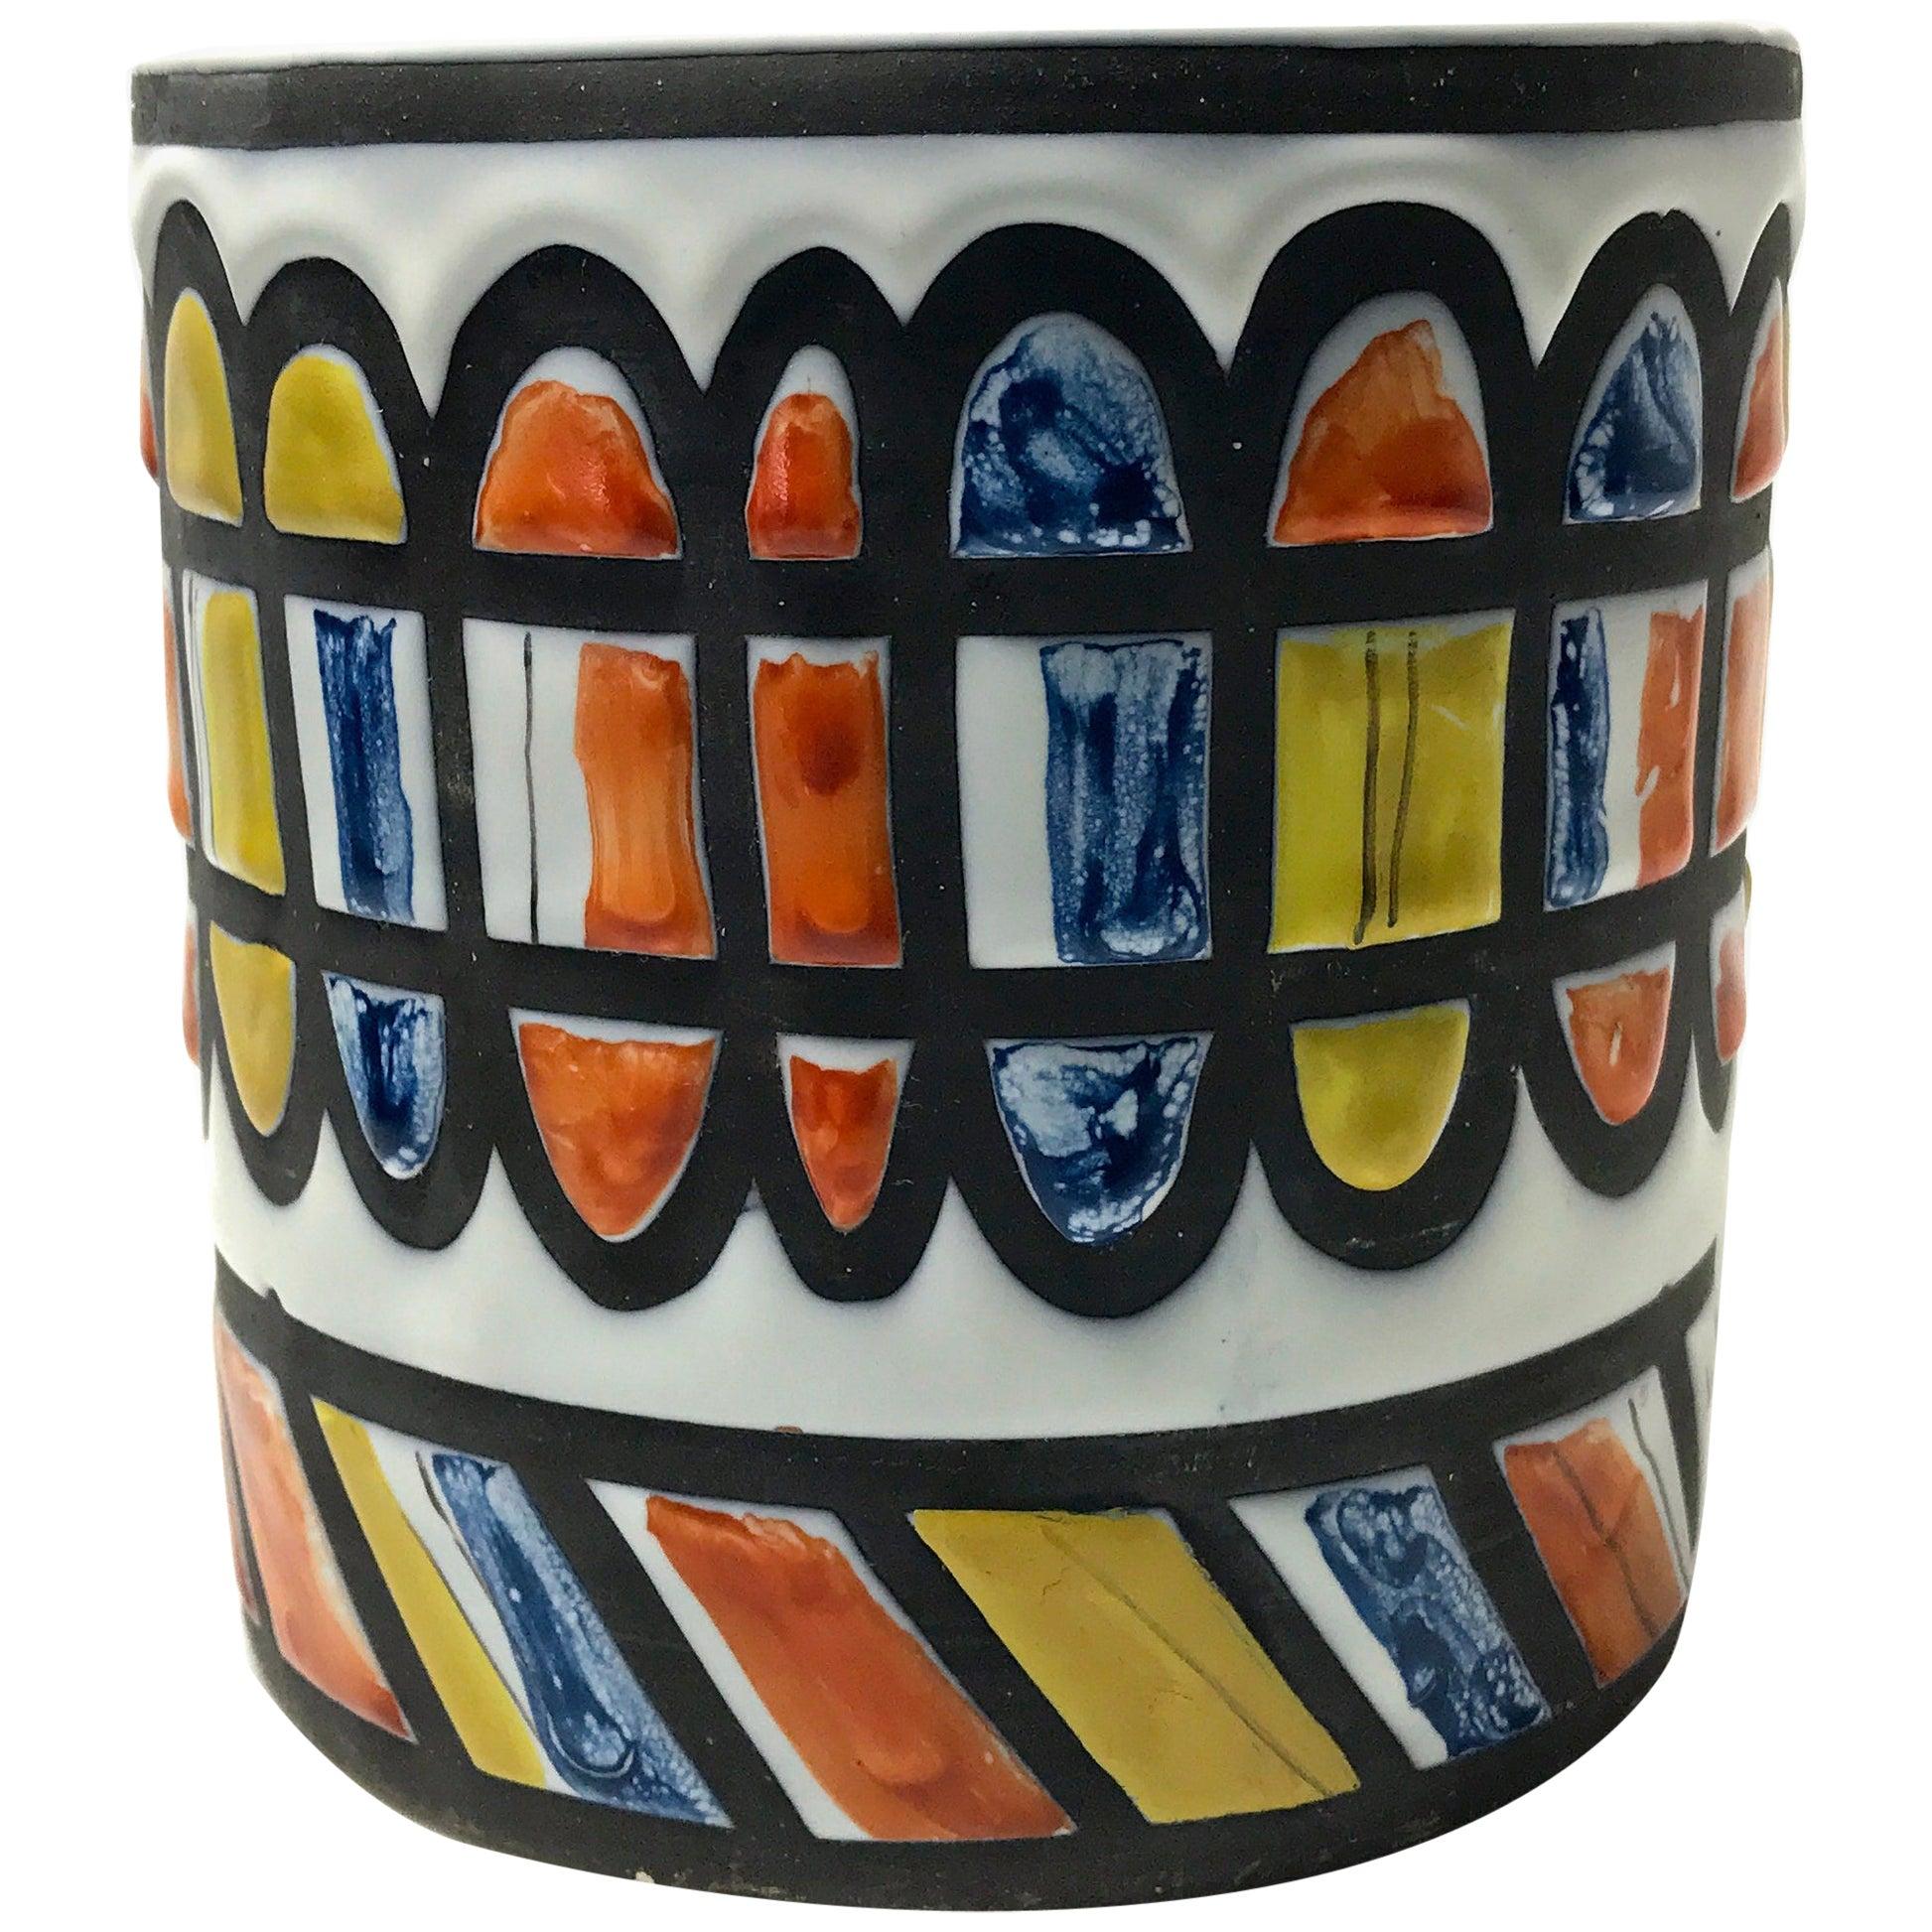 Roger Capron for Vallauris, Signed 1950 Ceramic Geometric Cachepot